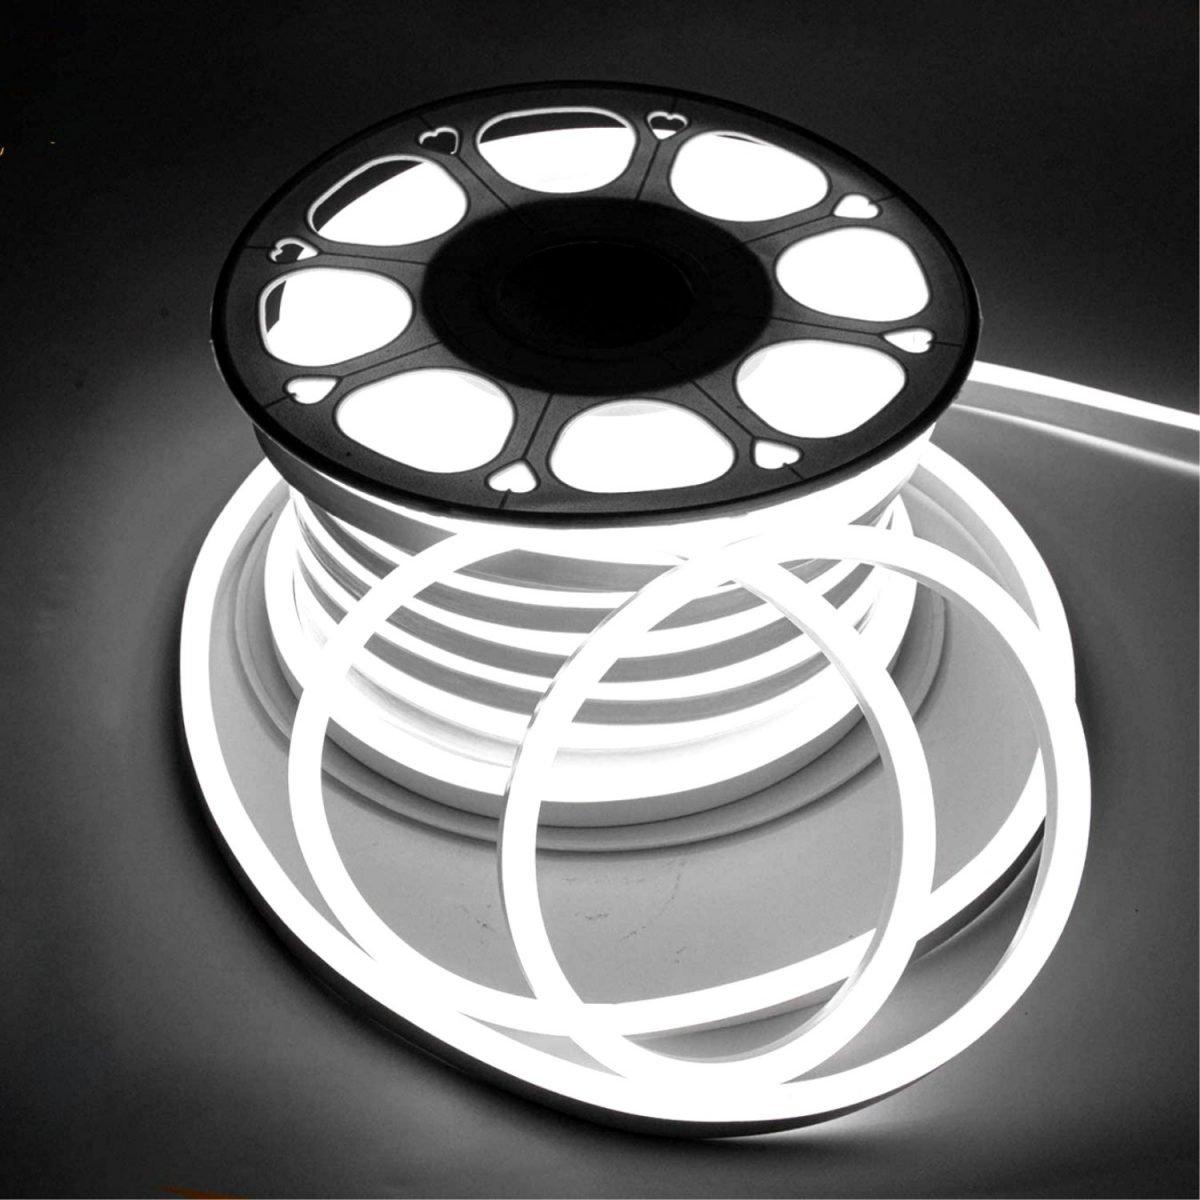 LED Neon Flex Cool White 8x16mm AC 220V 240V